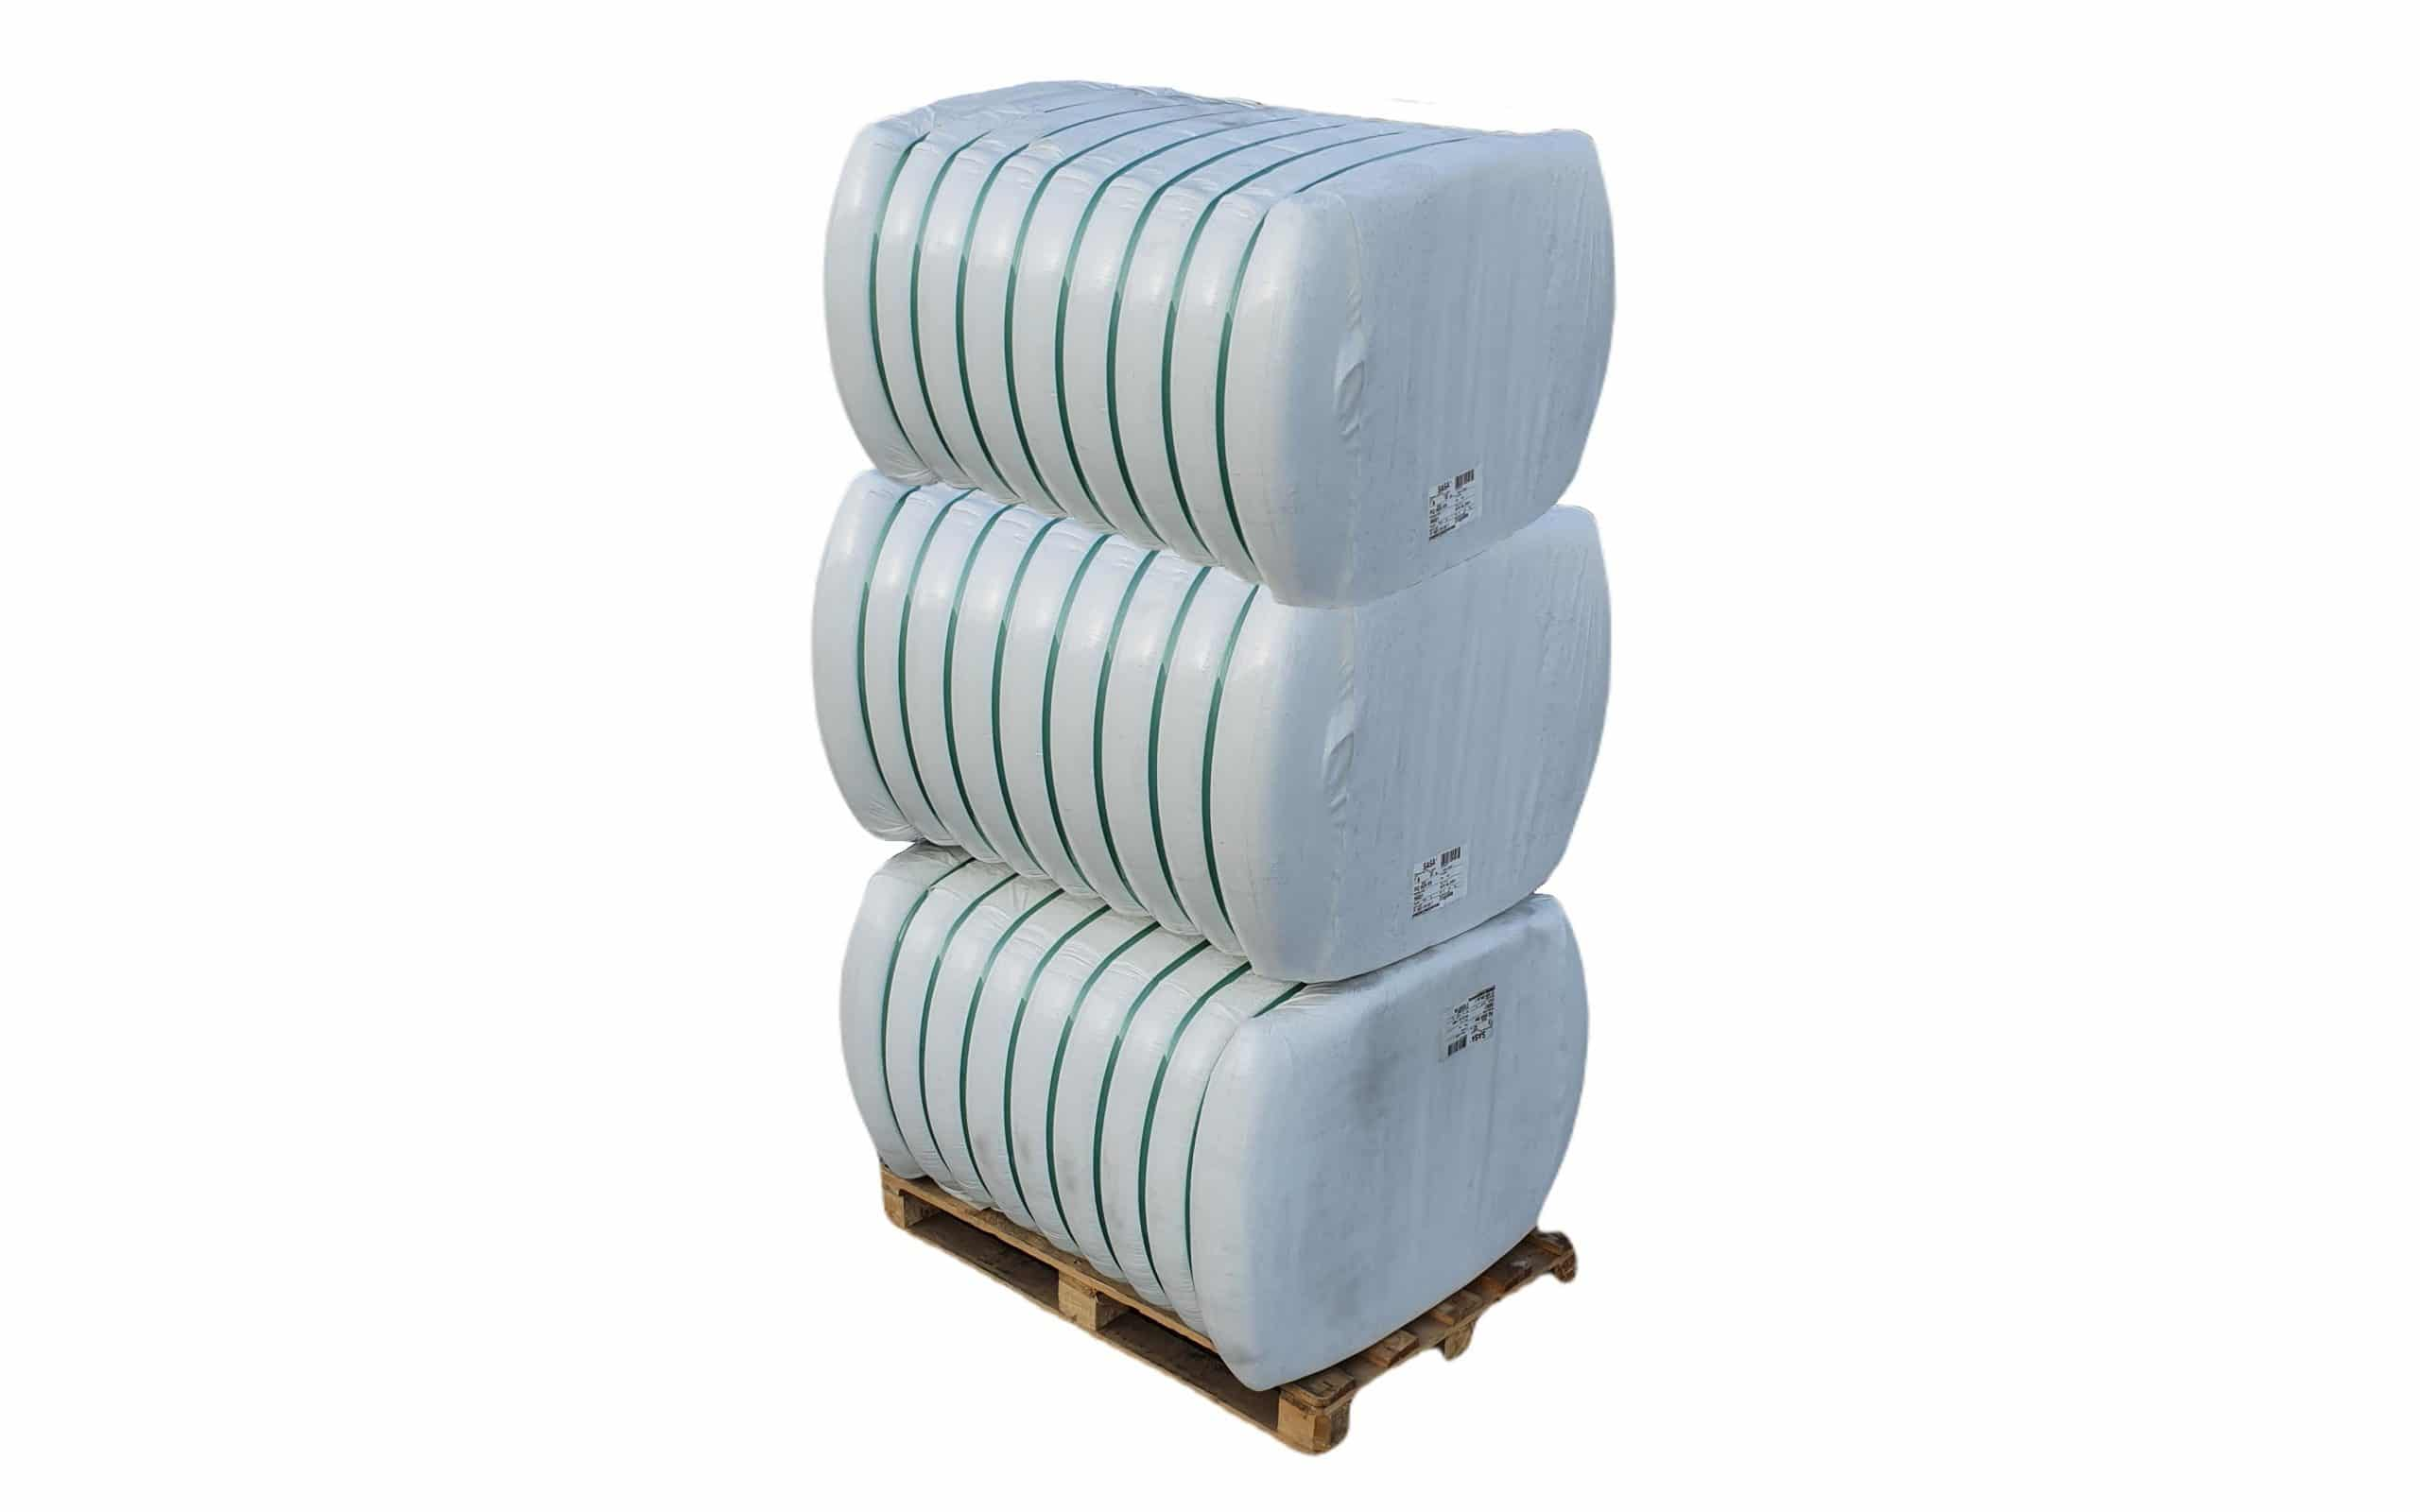 Fibra poliester hollow siliconizata conjugata, HCS 7D x 32 mm pentru fabricare umplutura perne si pilote, 3 x 250 Kg poza somnart.ro